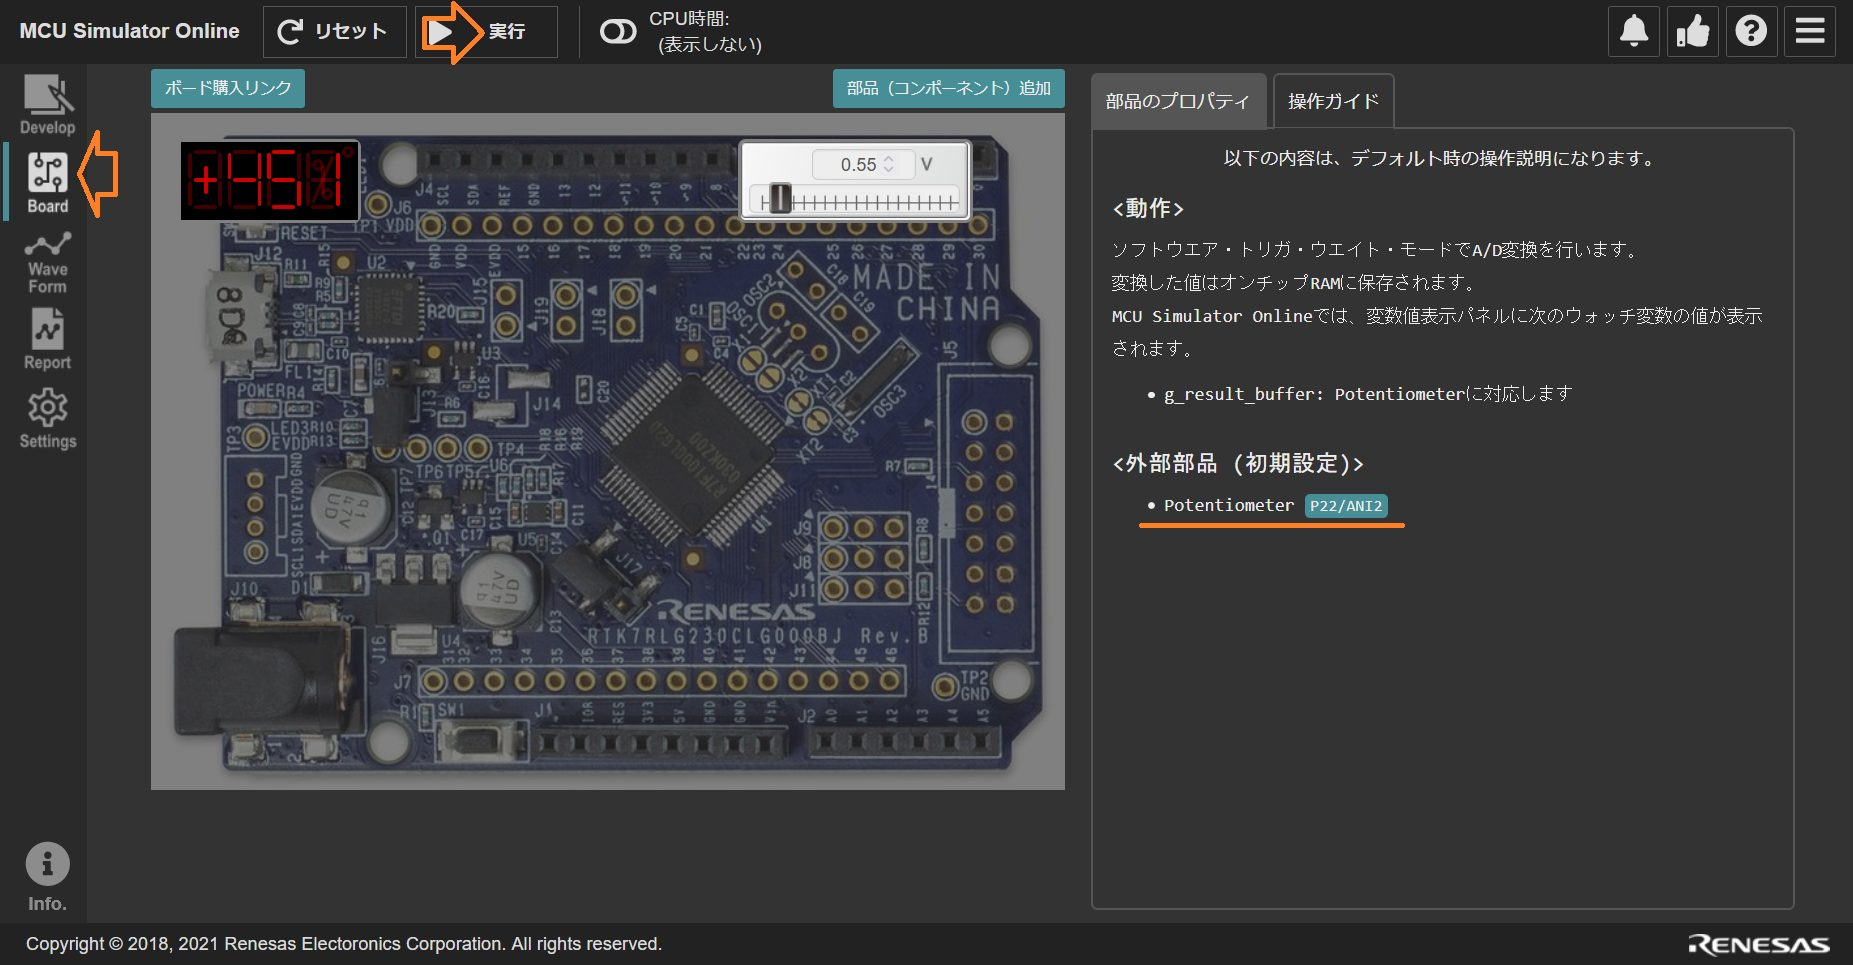 RL78/G23 A/D変換アプリケーションのFasr Prototyping Board画面